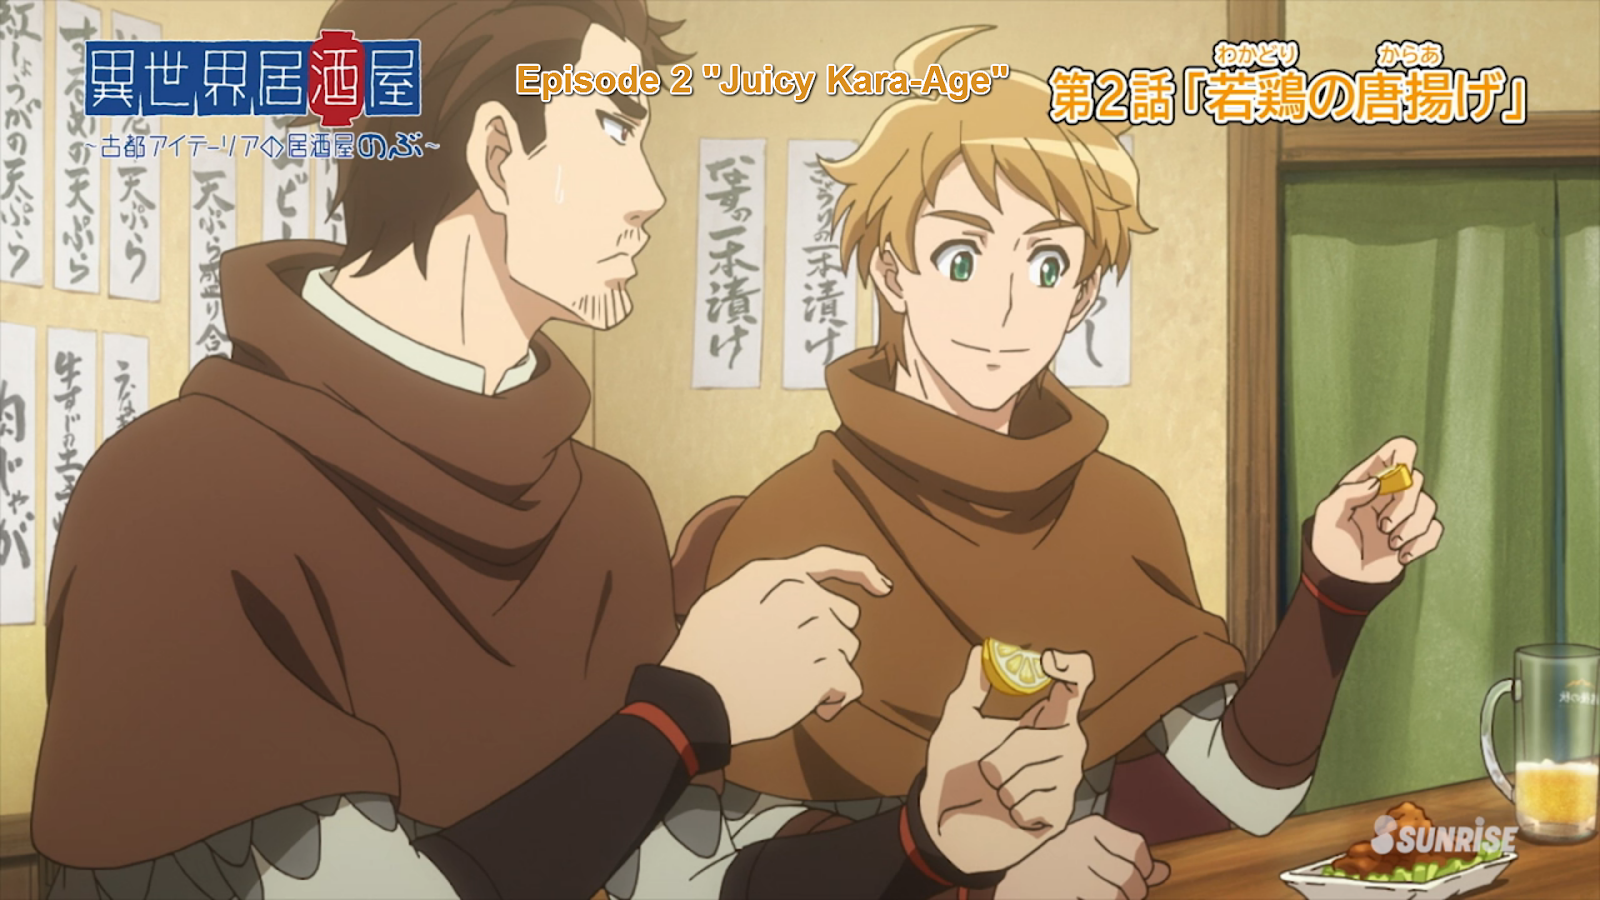 Lemons And Alpacas In Anime Isekai Izakaya Japanese Food From